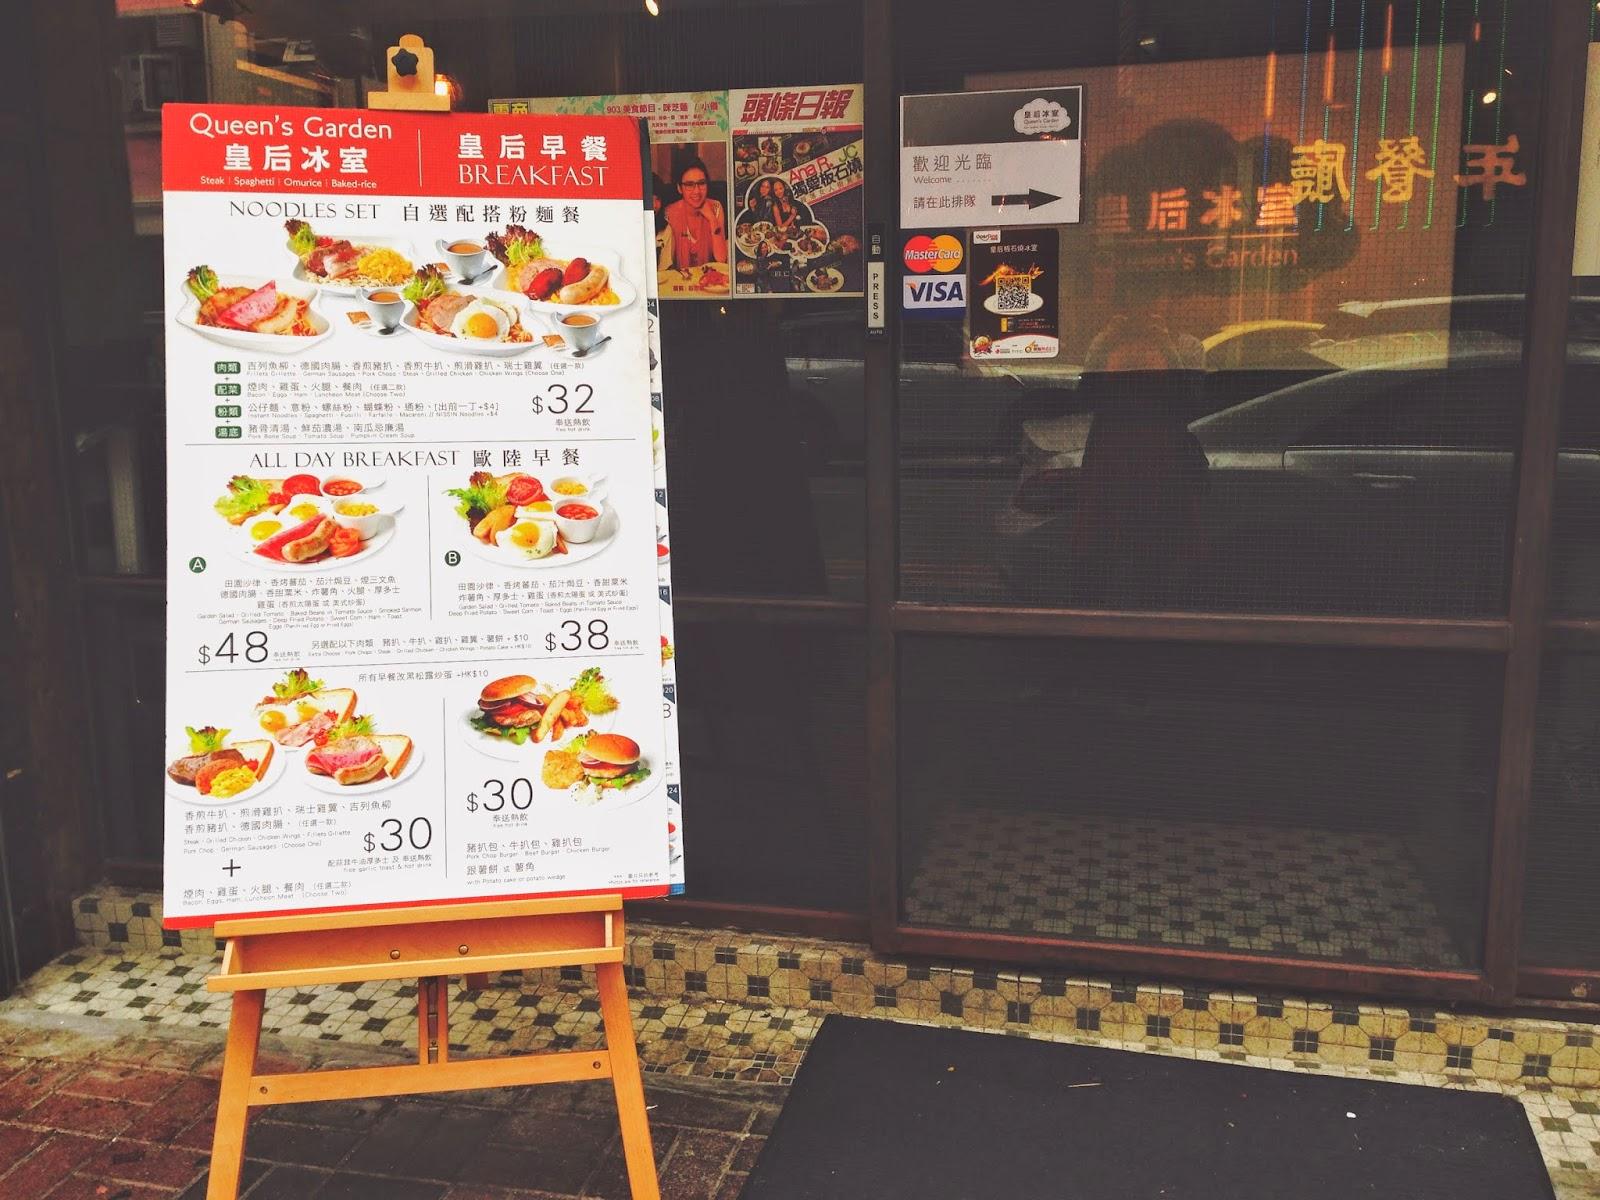 Queen's Garden Sai Yeung Choi St Mongkok Hong Kong Breakfast Menu